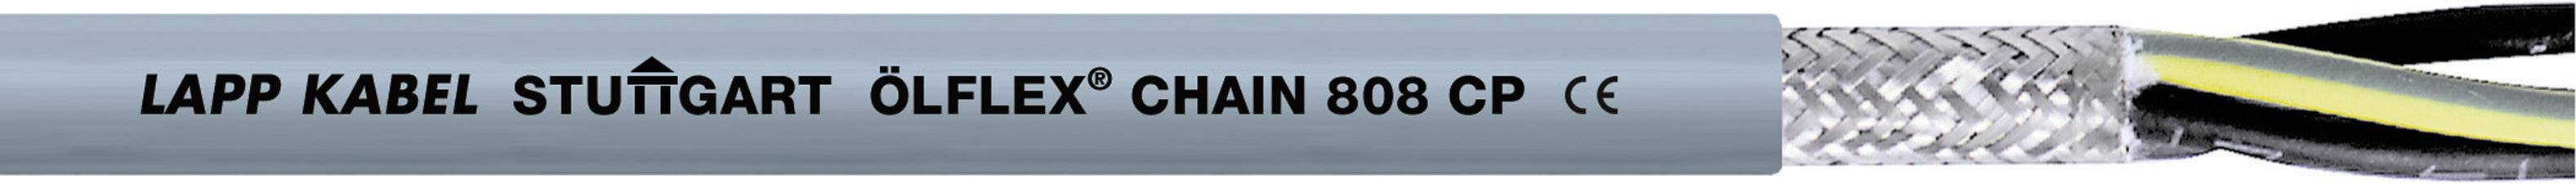 Žíla kabelu LappKabel ÖLFLEX CHAIN 808 CP 25G0,75 (1027766), 25x 0,75 mm², polyurethan, Ø 15,6 mm, stíněný, 50